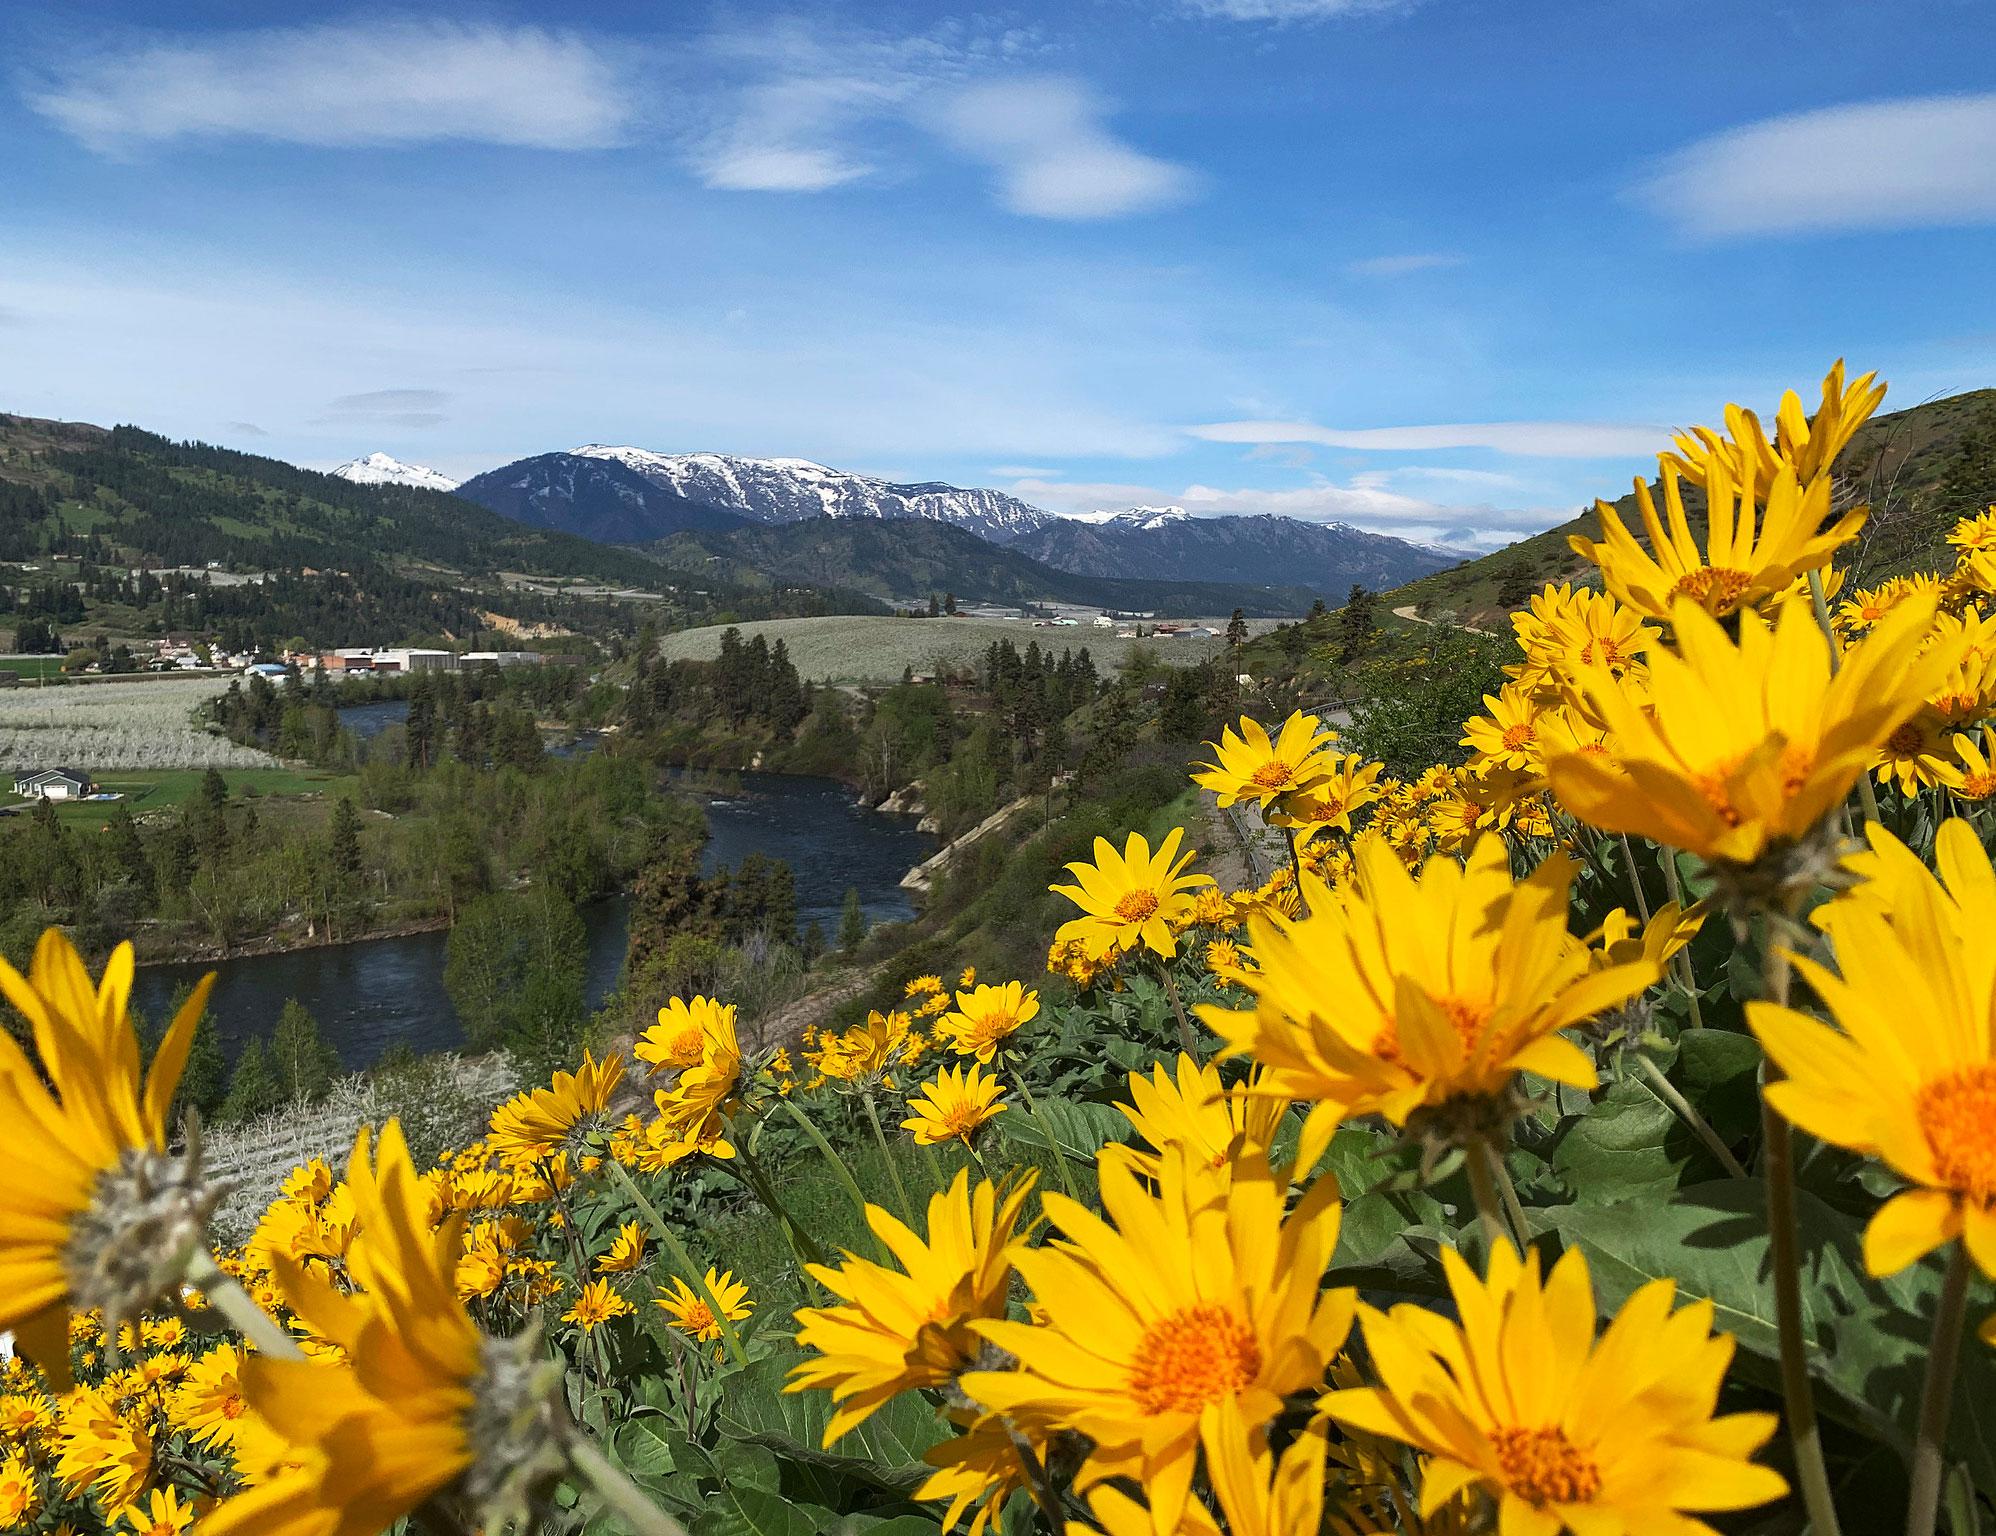 yellow flowers on hillside